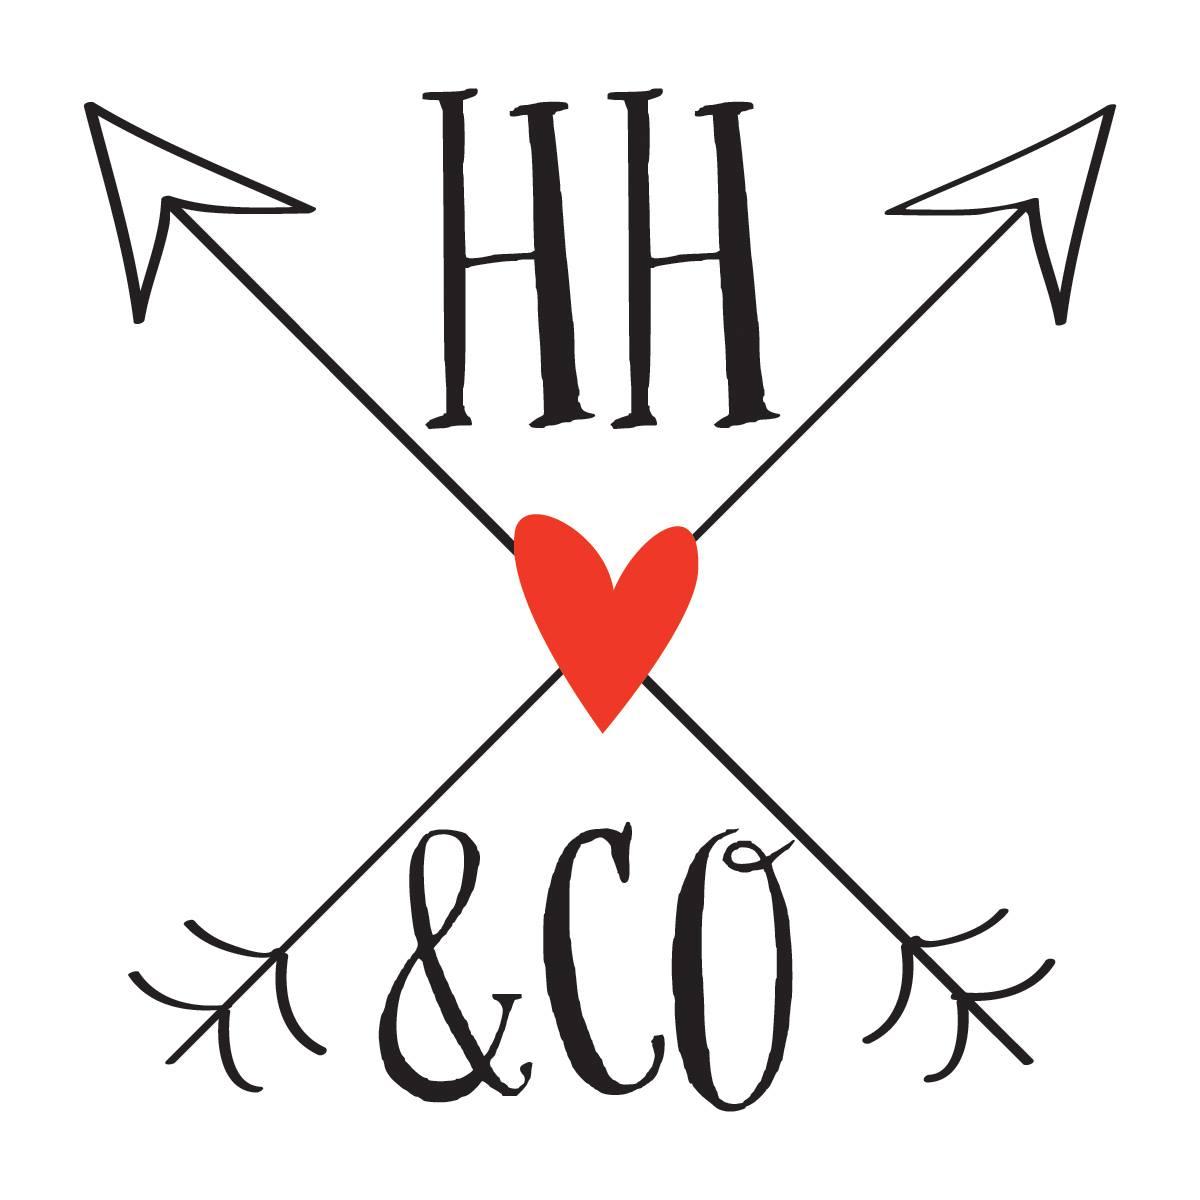 hh&co_logo